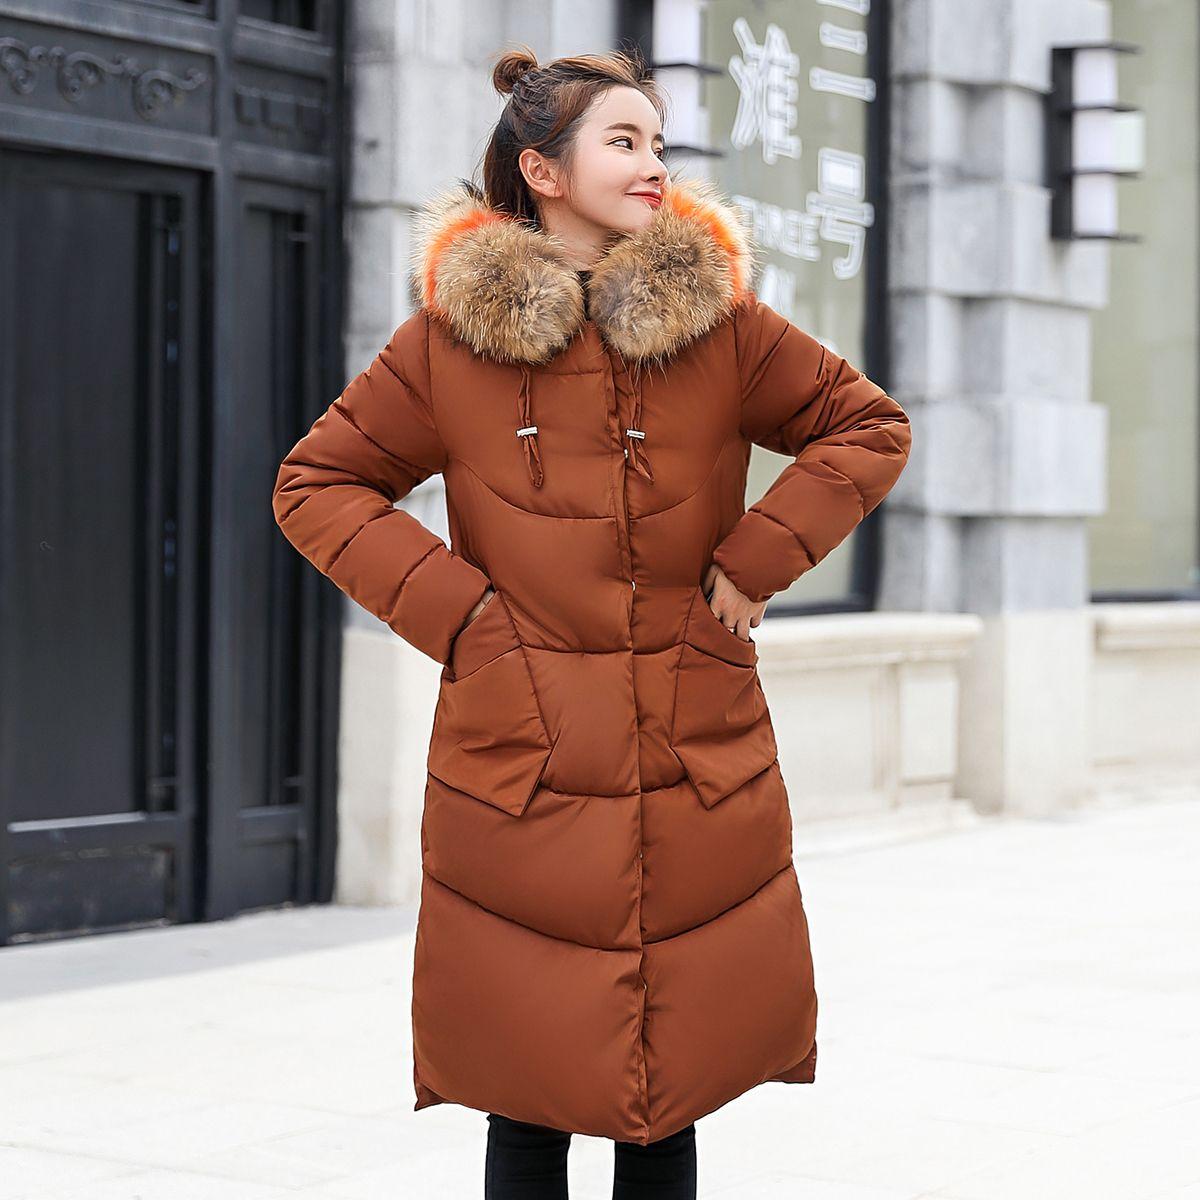 2018 Winter Frauen Mantel lange warme Parka weibliche Mode großen Pelzkragen Daunenjacke Baumwolle Frauen plus Größe dicken Parkas Damen Y18102502